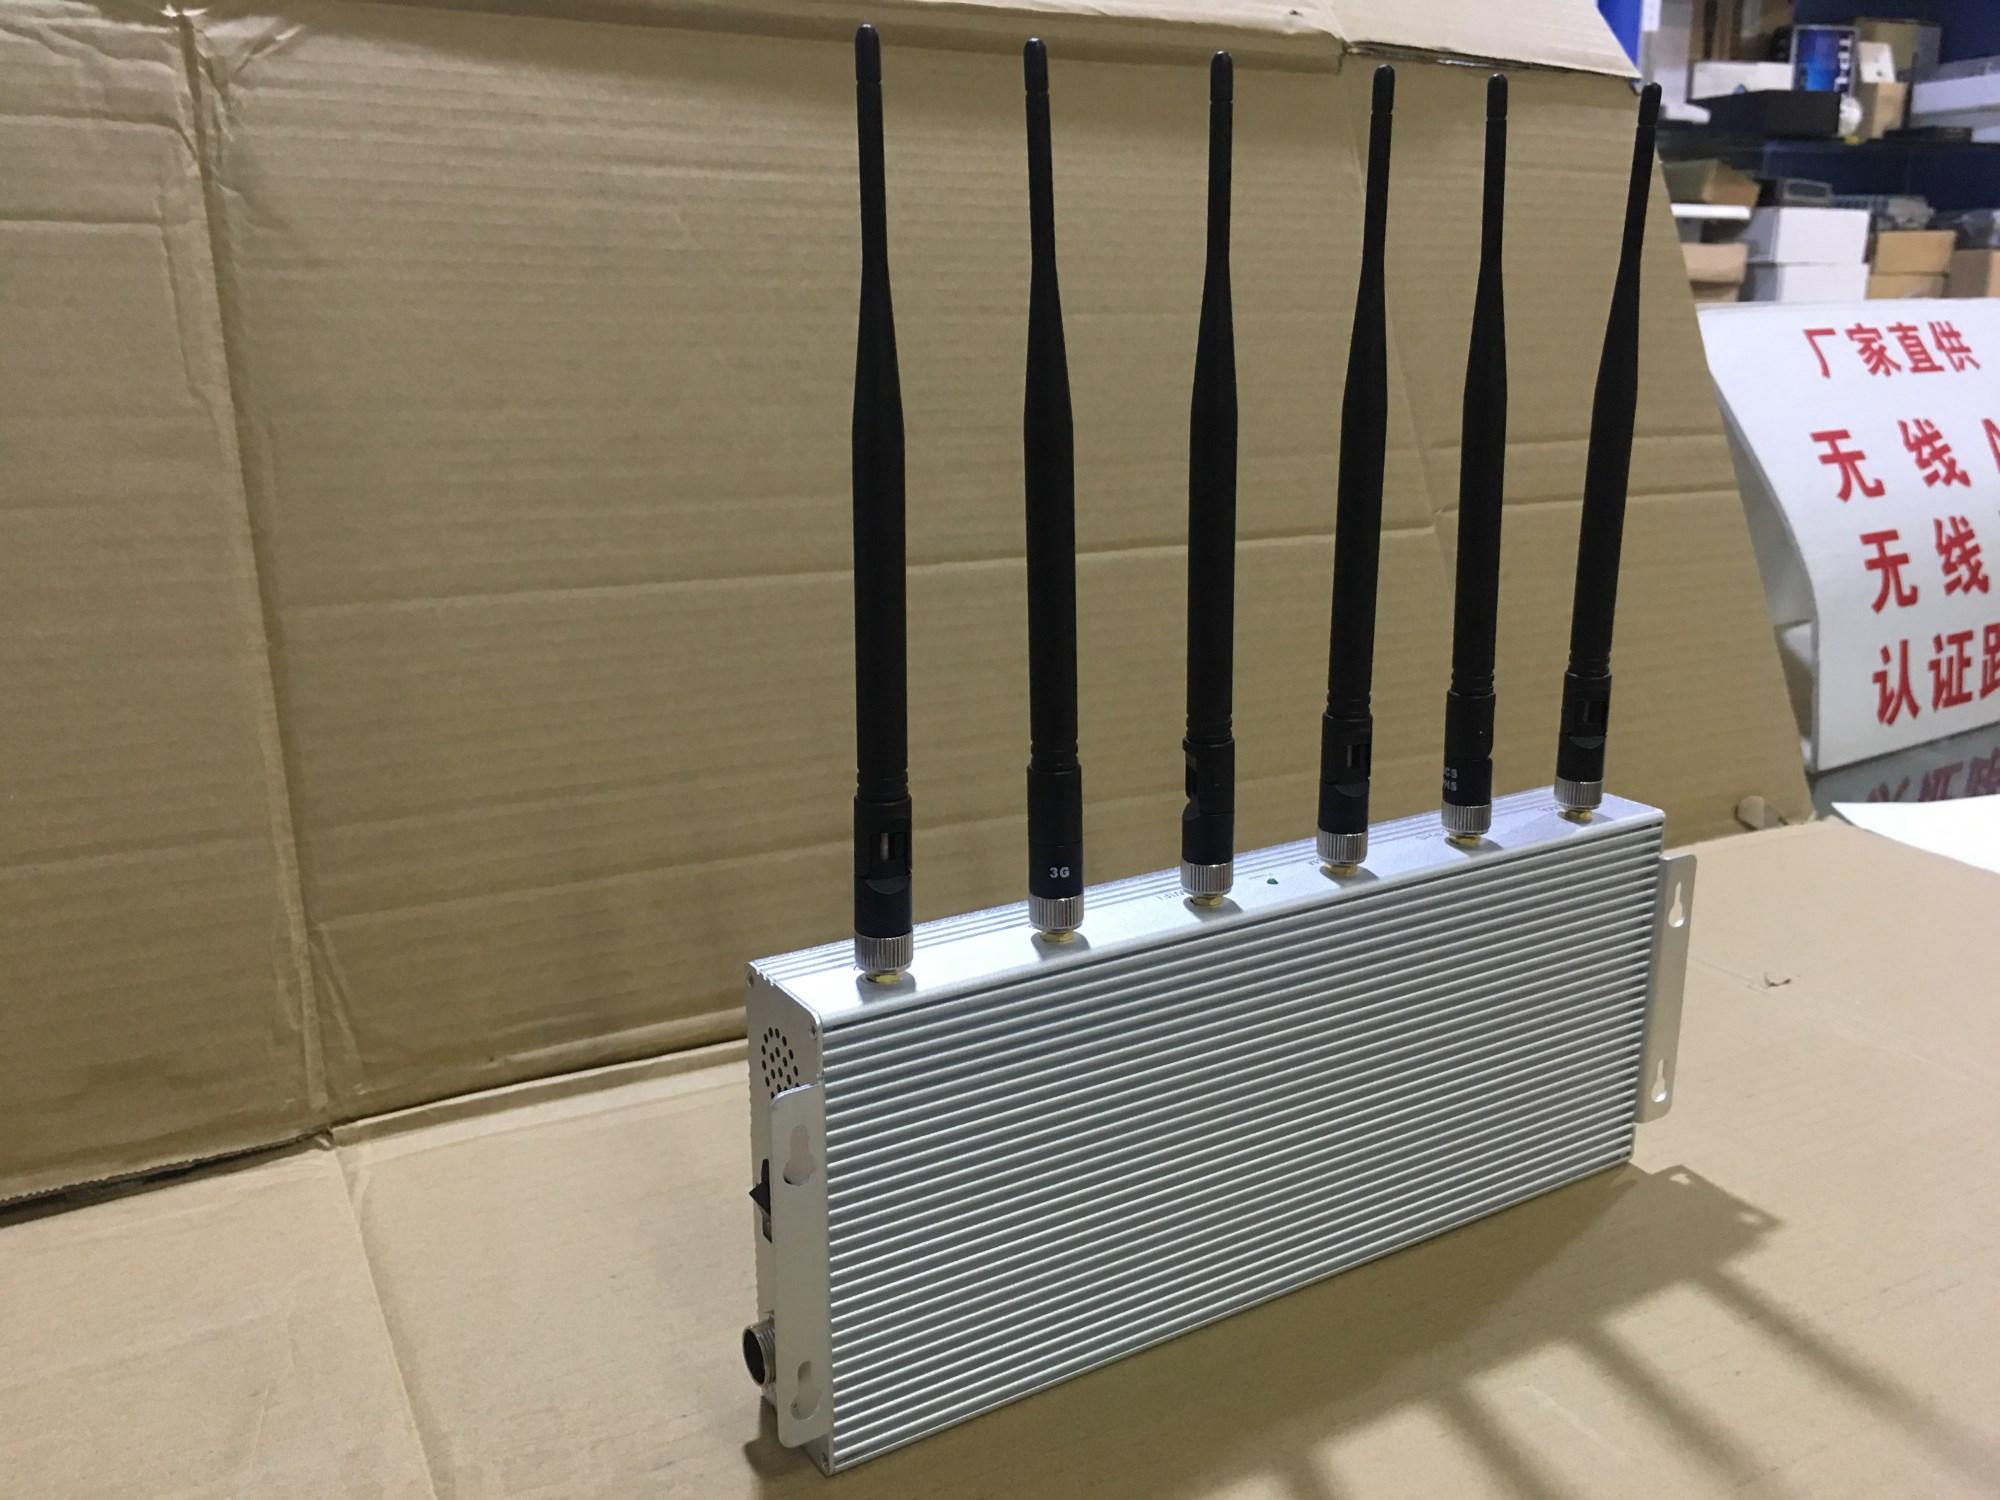 SYT-401E-6多功能无线信号屏蔽器(含3G+4G+WIFI)